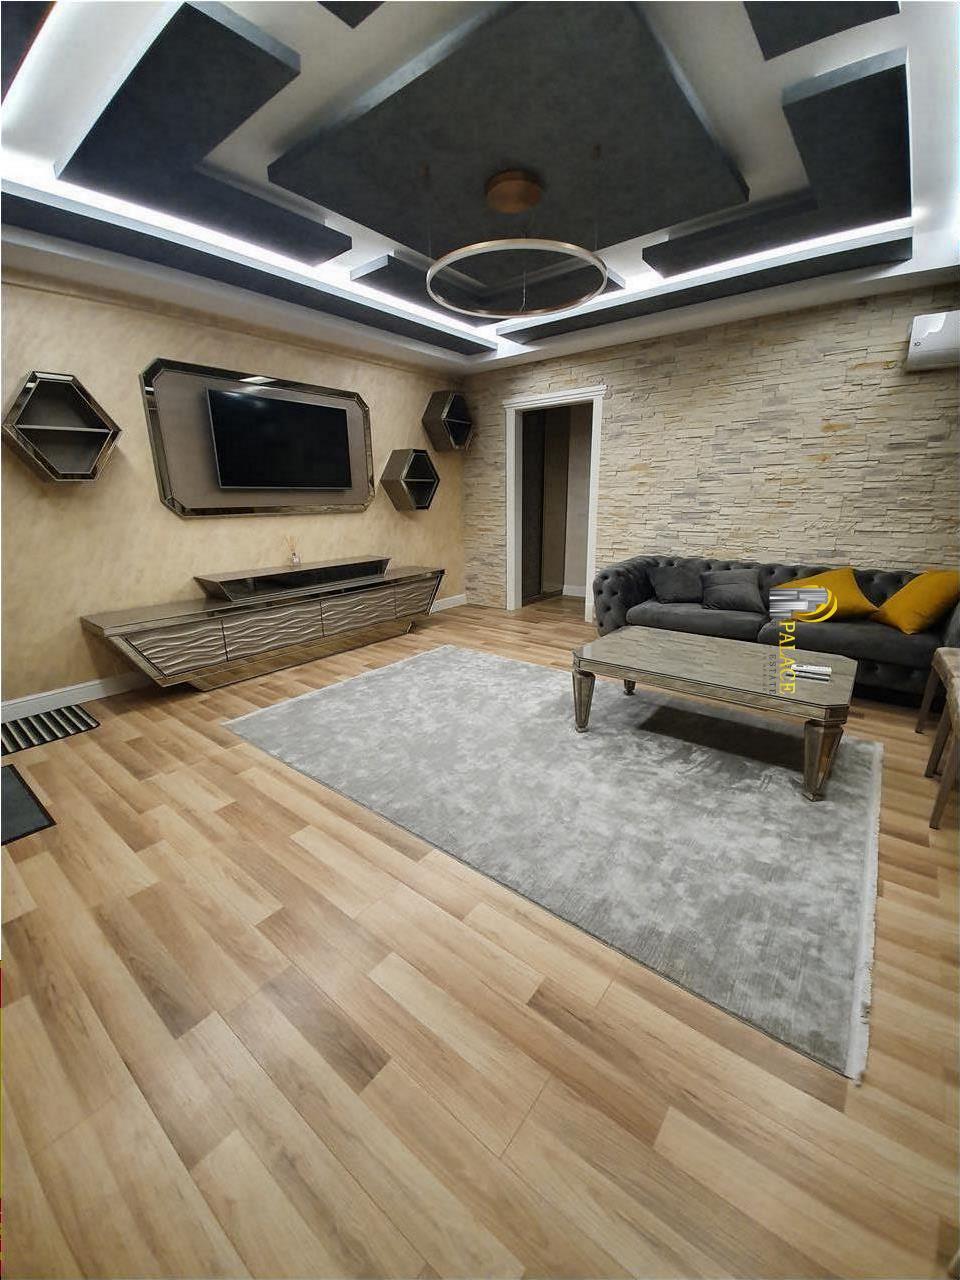 De vanzare,Apartament 2 camere,Bucium,Mutare Imediata